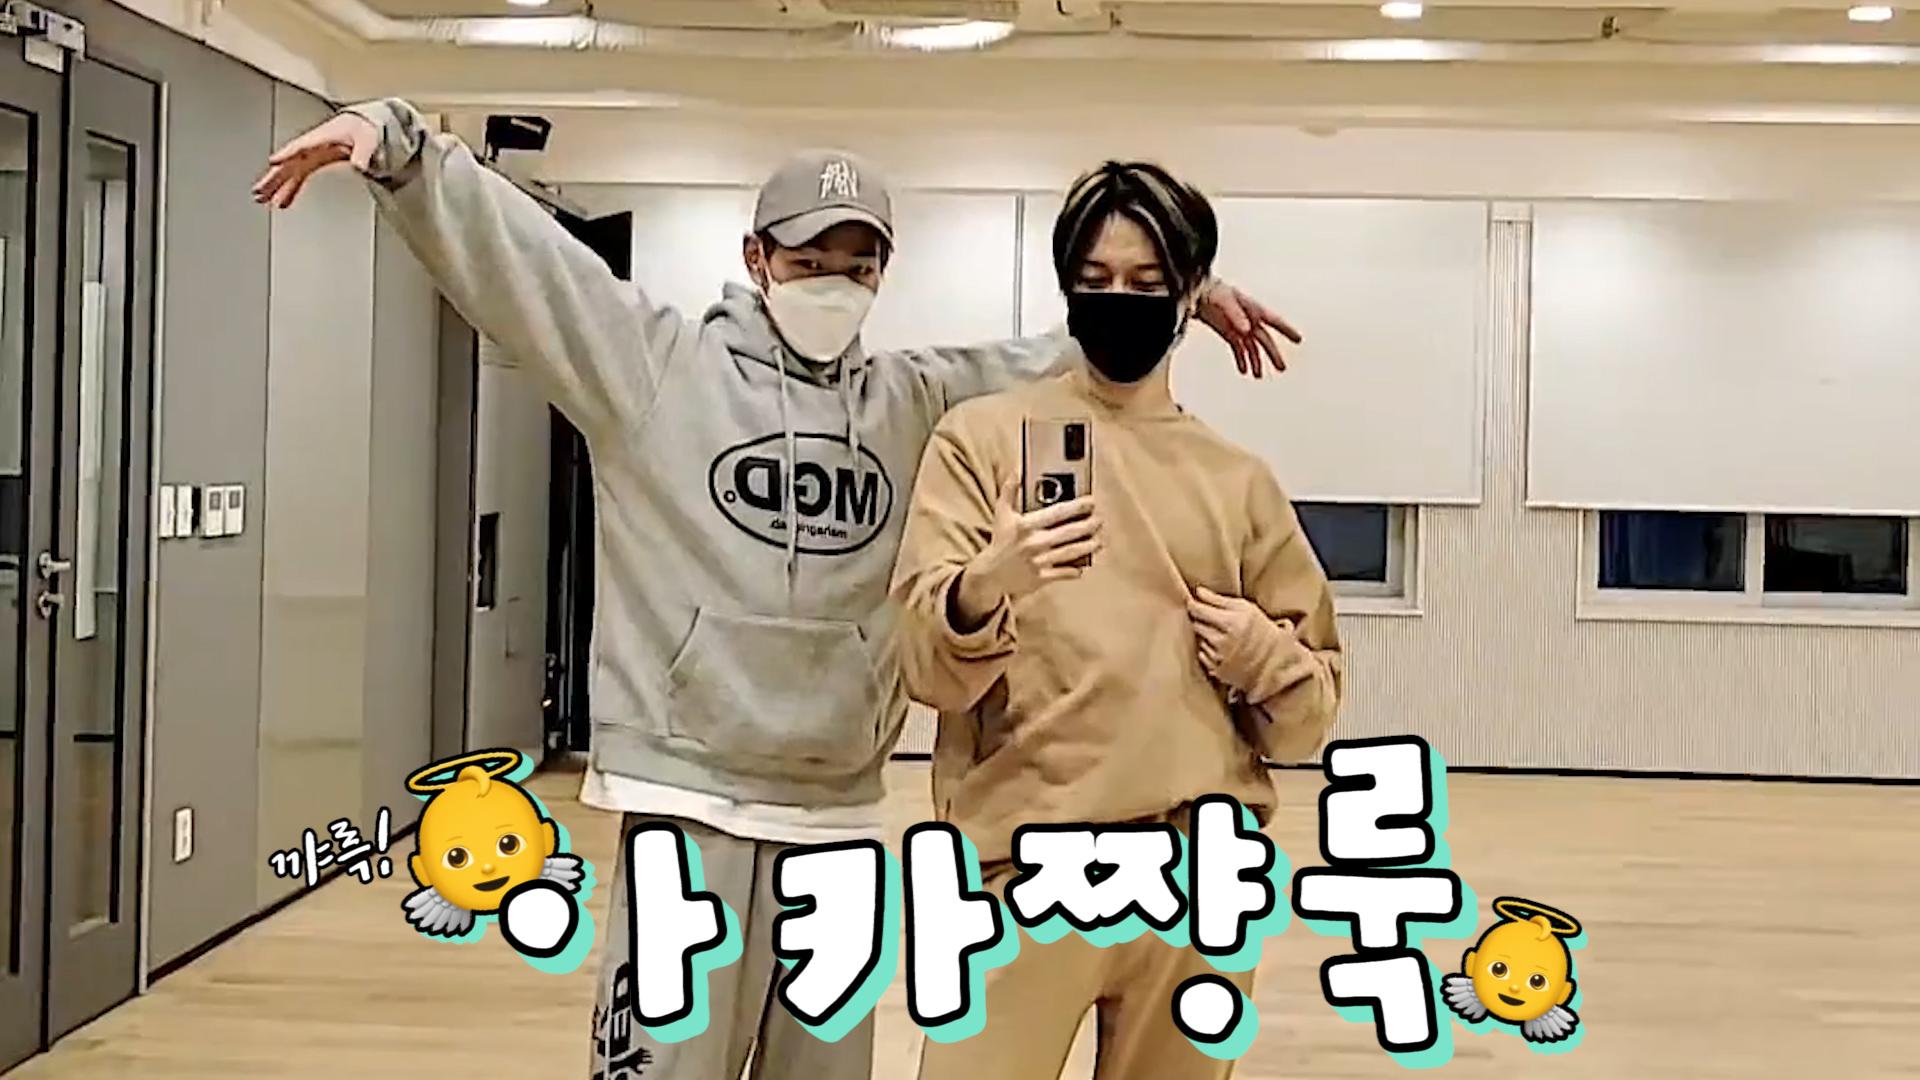 [SHINee] 완전 우주에서 제일가는 큐트 베이비세요👼 (Onew&Taemin talking about their comeback teaser)